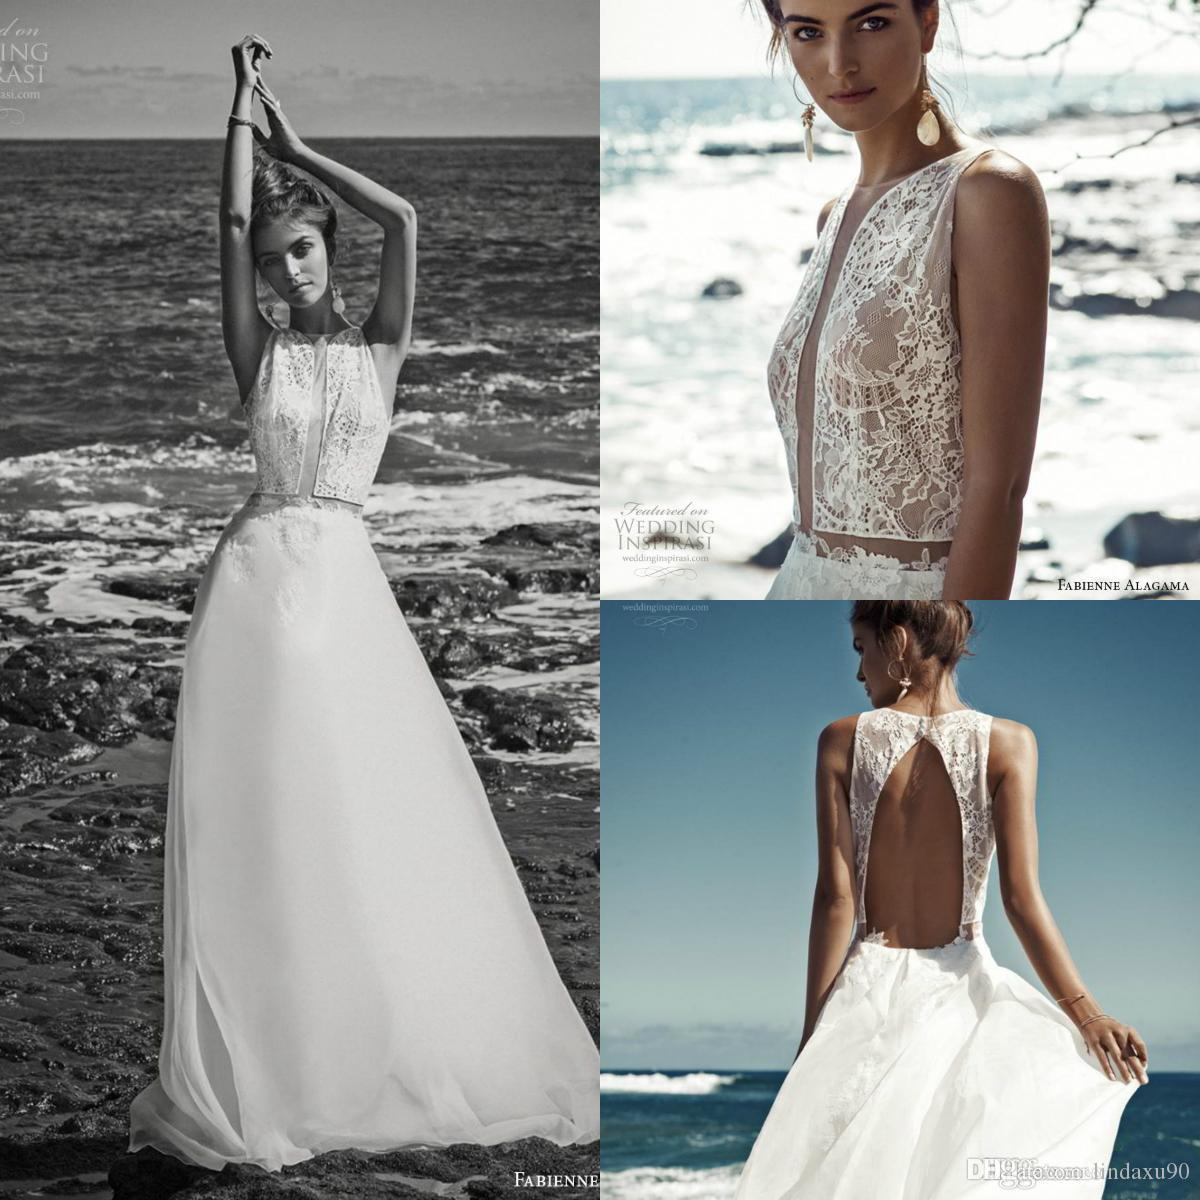 2019 Summer Beach Wedding Dresses Jewel Neck Lace Appliqued Boho Chiffon Floor Length Wedding Dress Bridal Gowns Custom Made